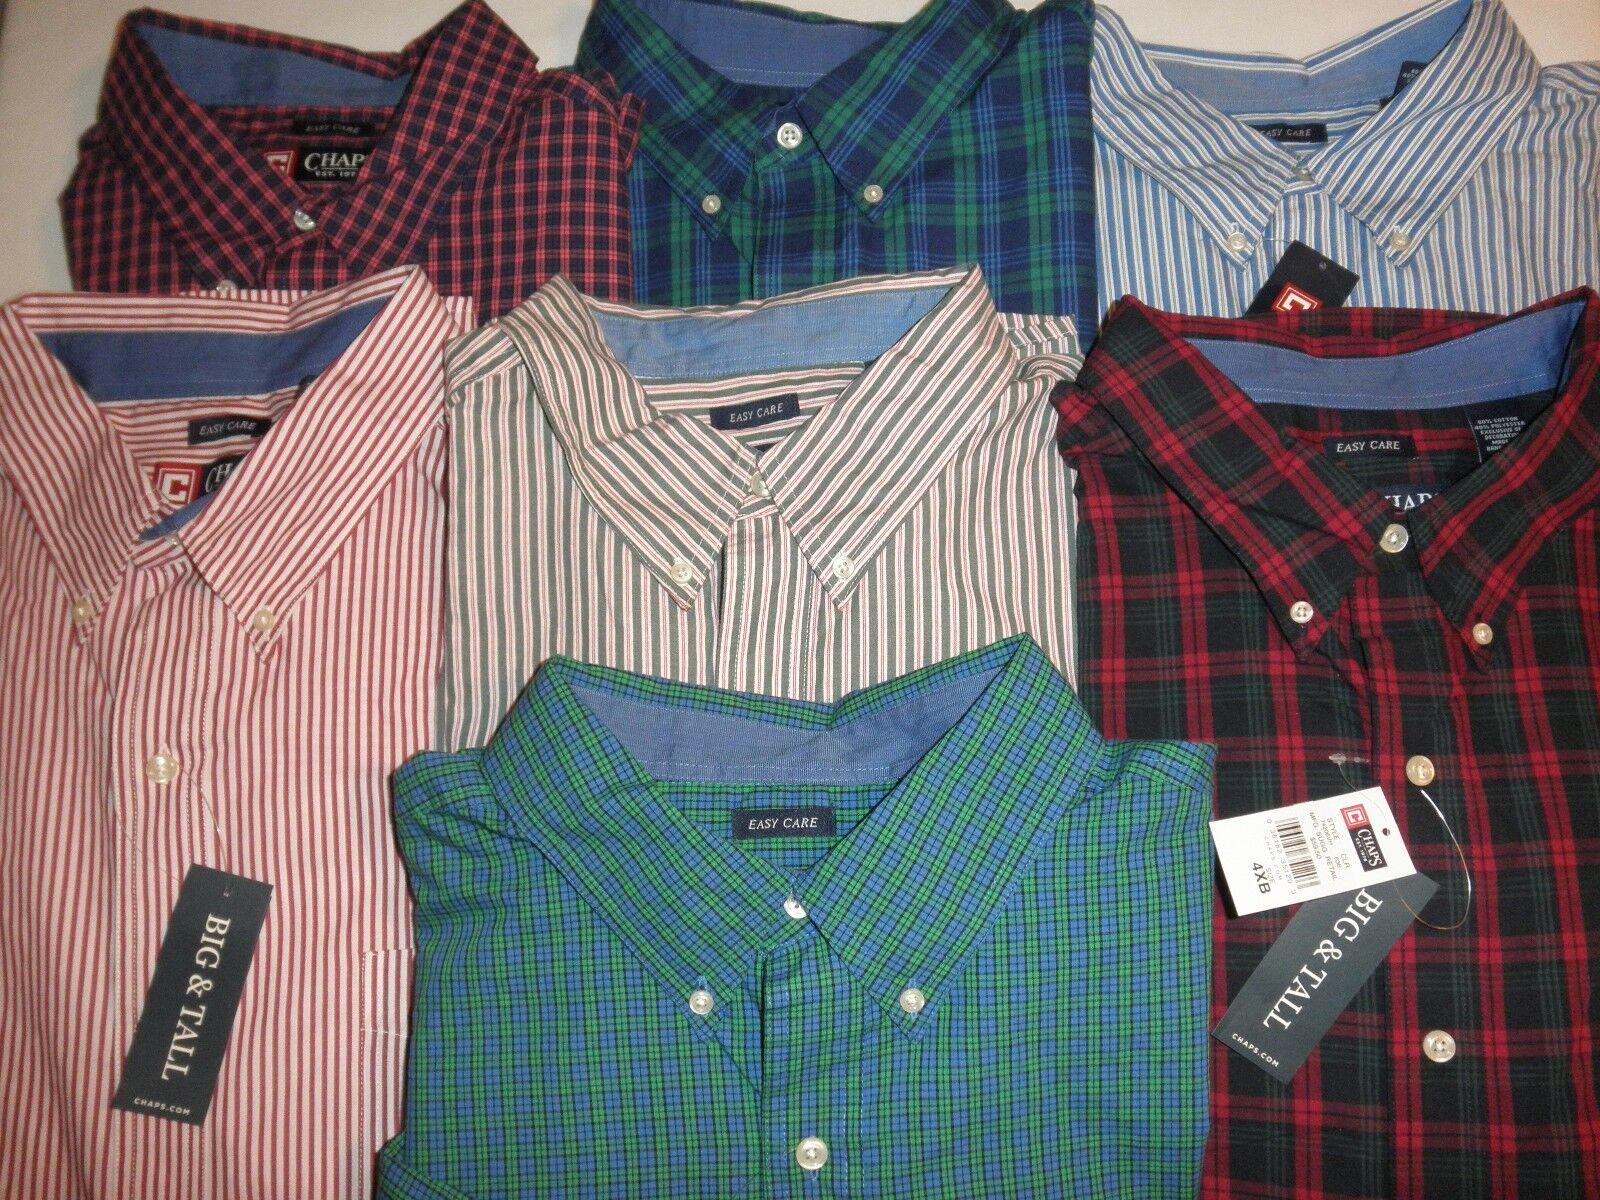 Nwt 59 Chaps Mens Big And Tall Long Sleeve Shirts Xlt